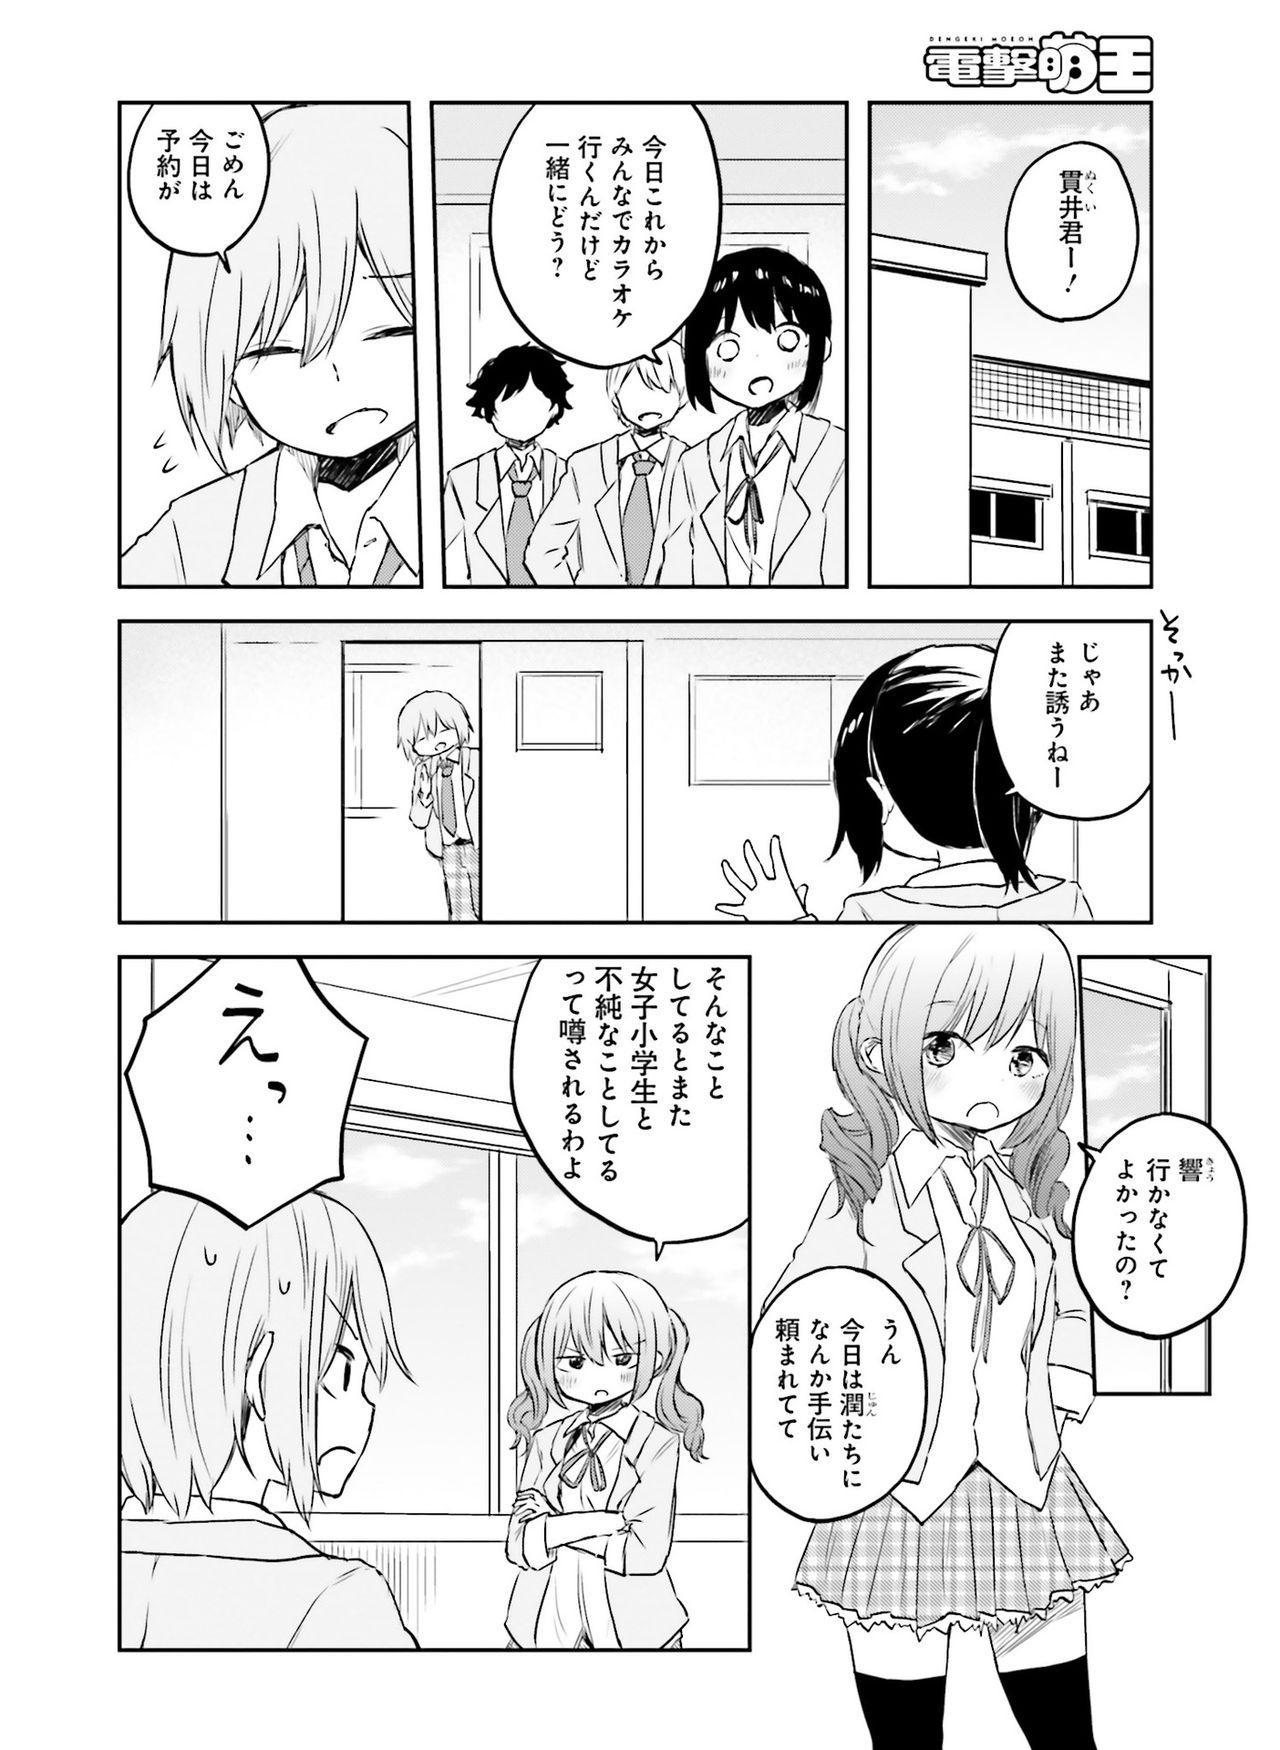 Dengeki Moeoh 2016-12 62